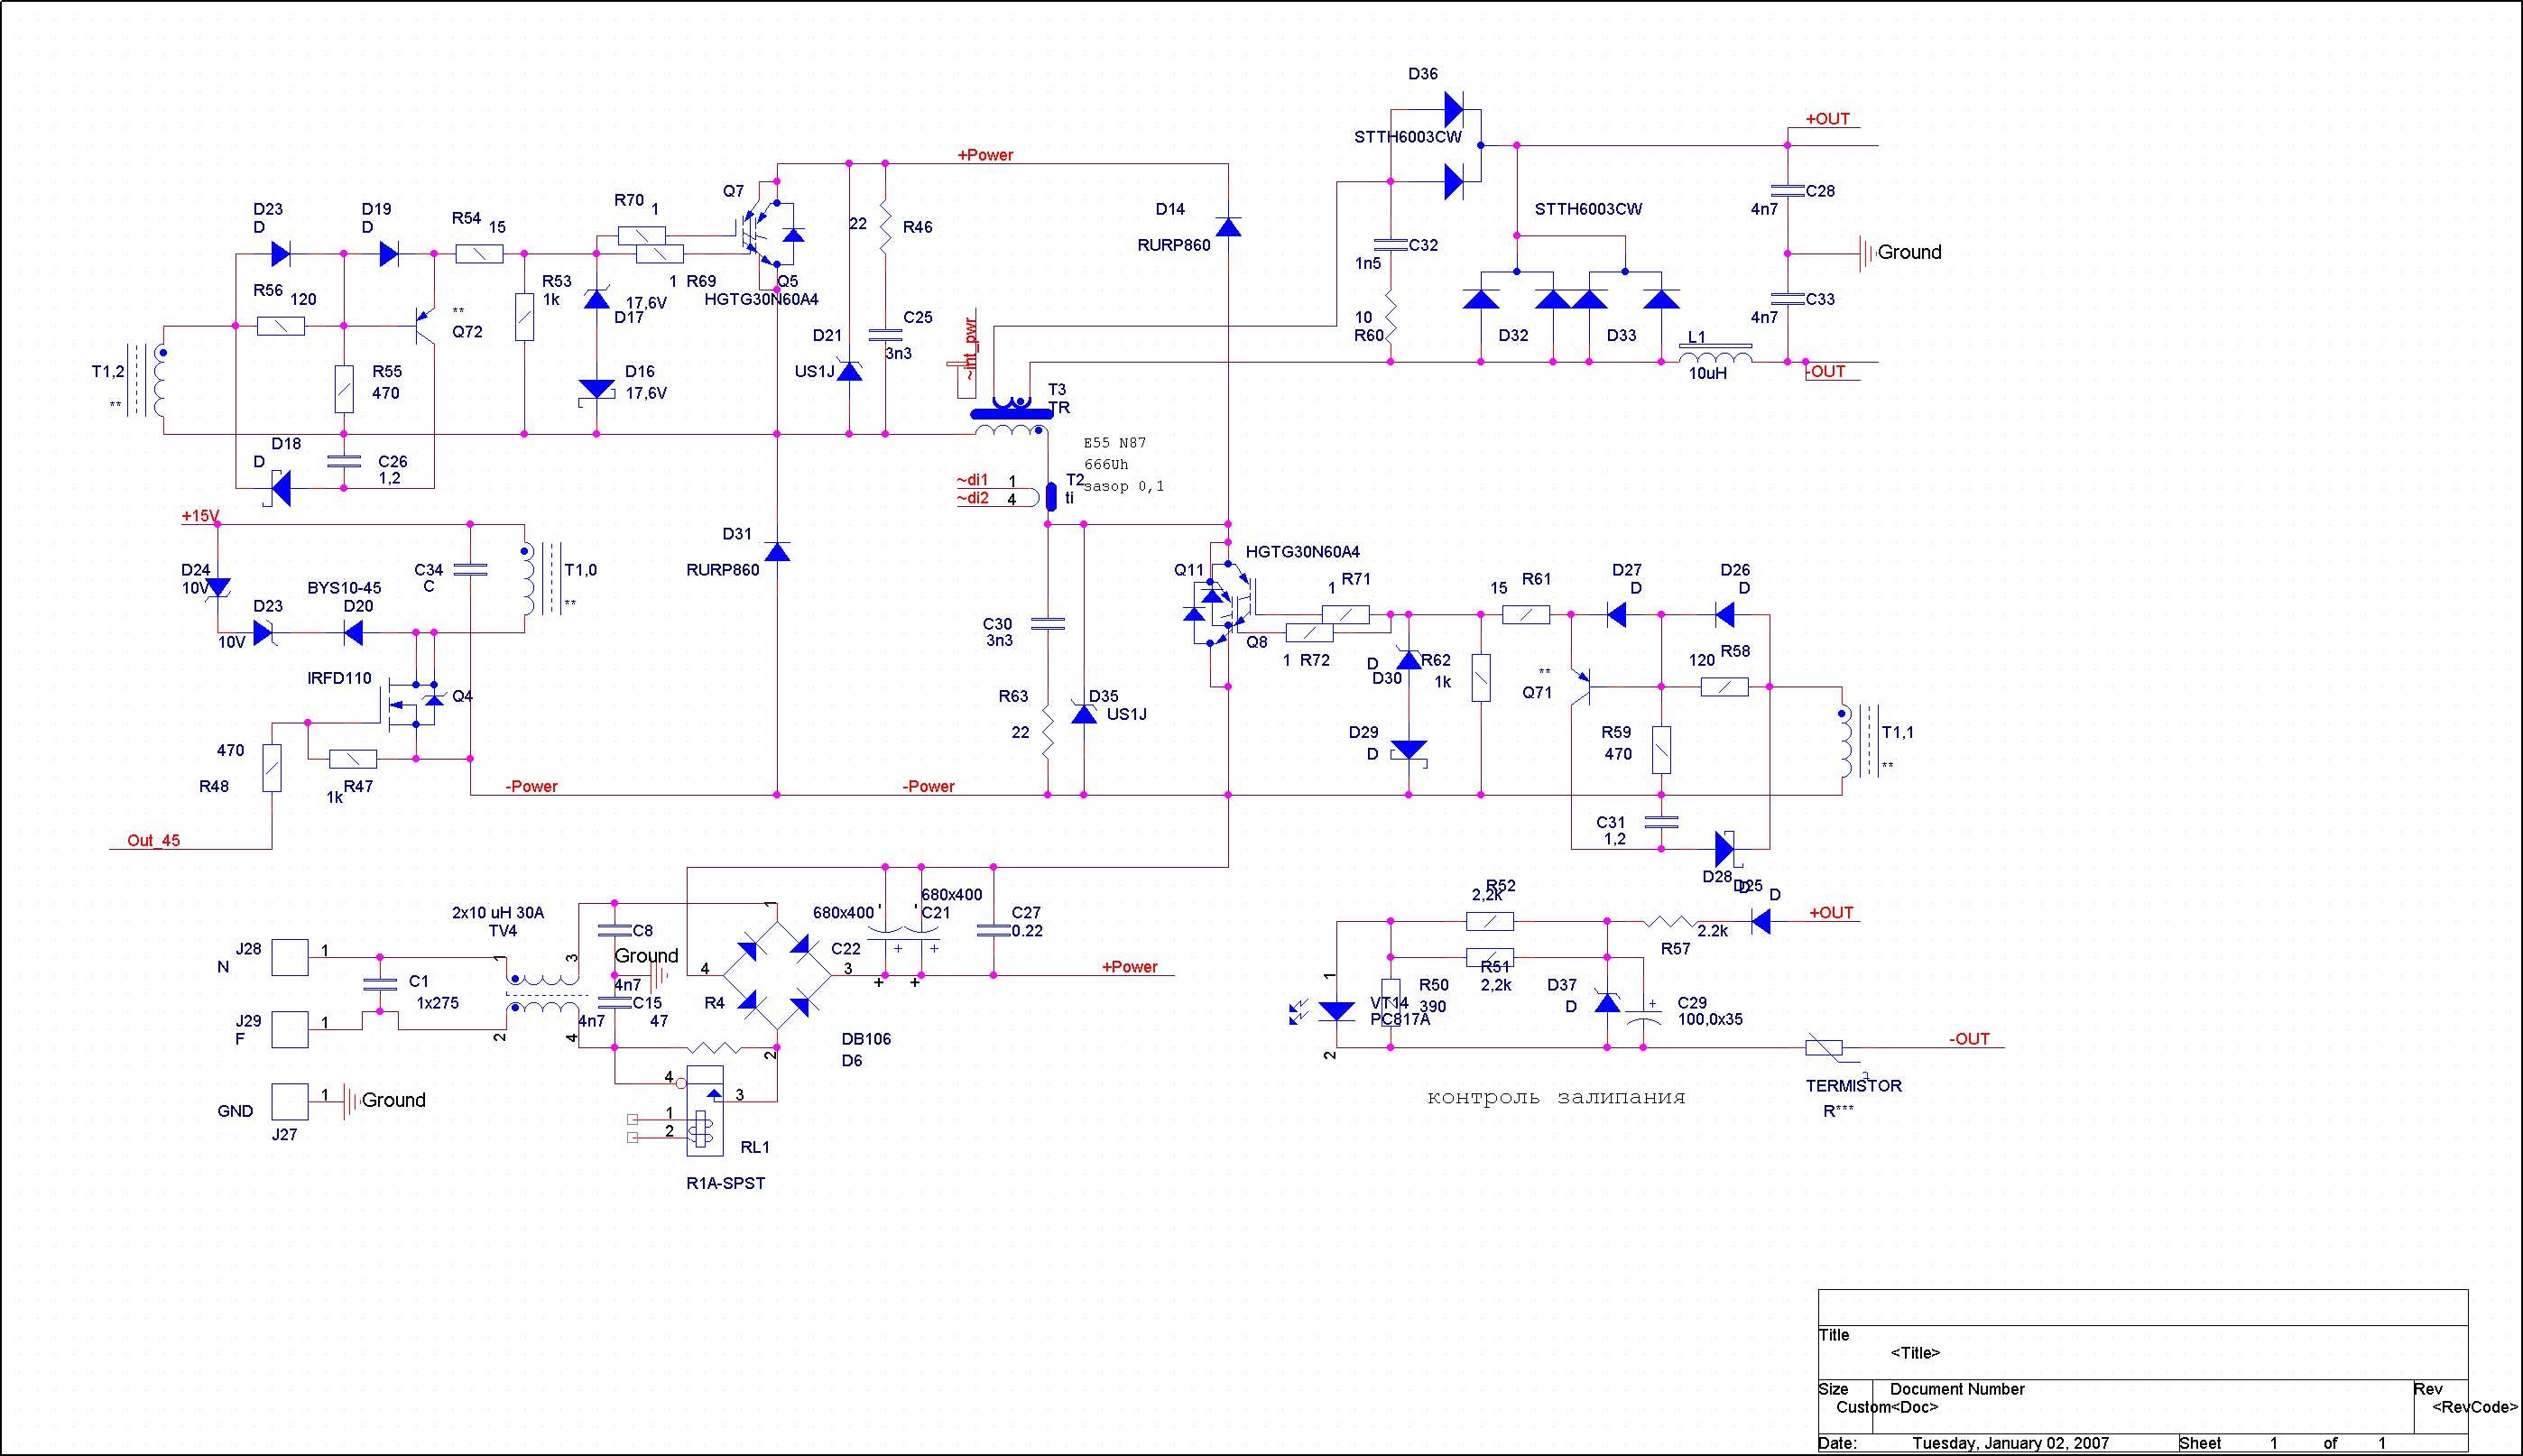 Сварочный аппарат иса схема сварочные аппараты для аргонодуговой с